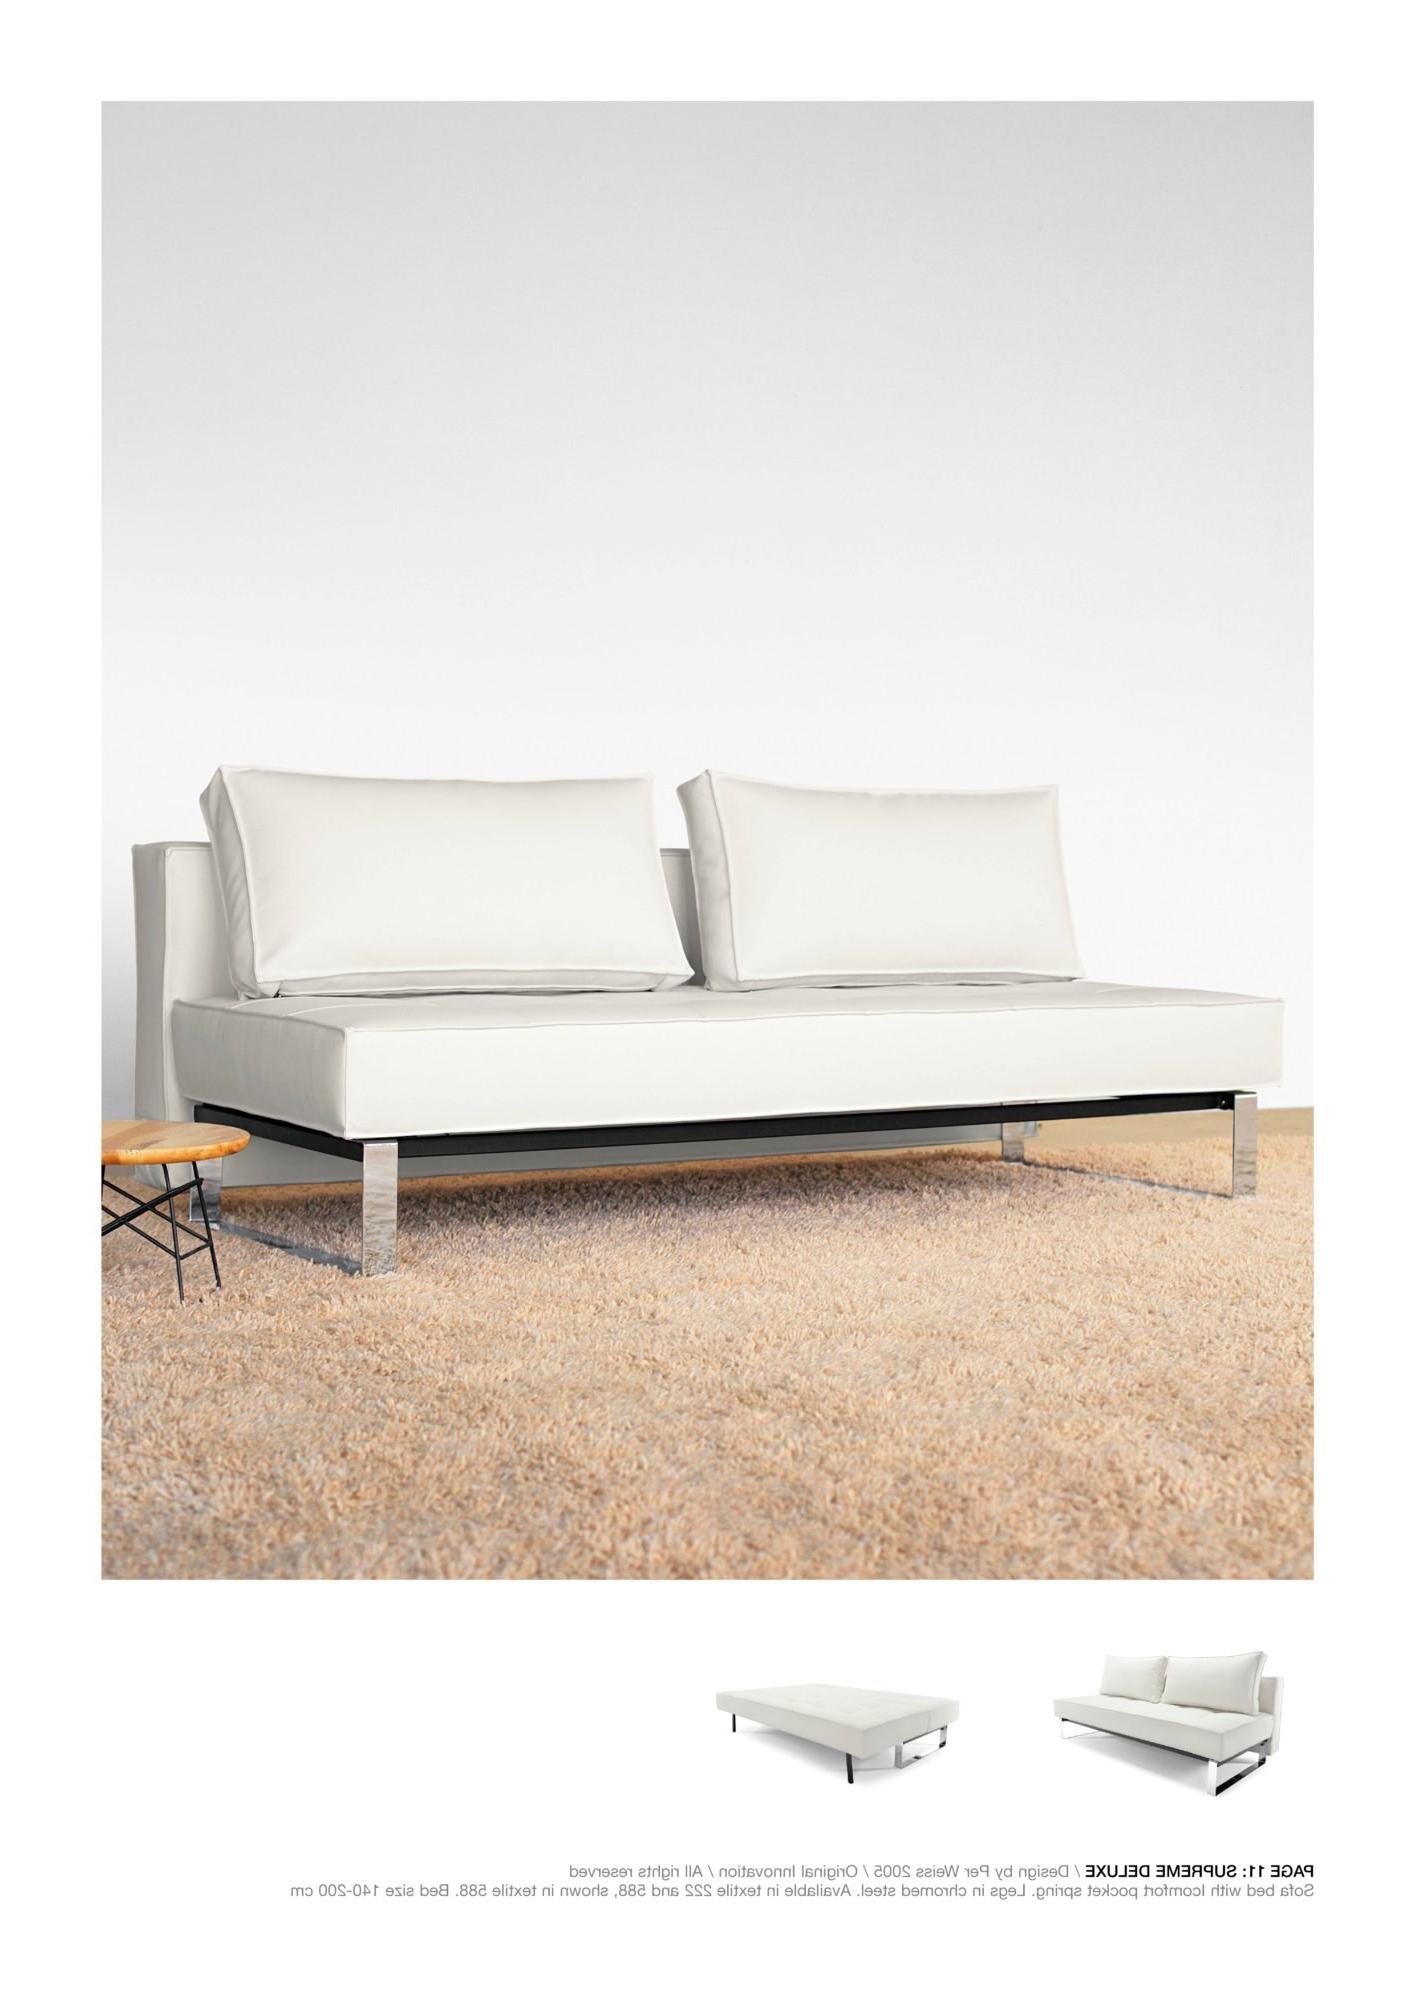 Kibuc sofas Cama Q0d4 sofa Kibuc Barato Tienda De Muebles Arganda Muebles De Oficina En